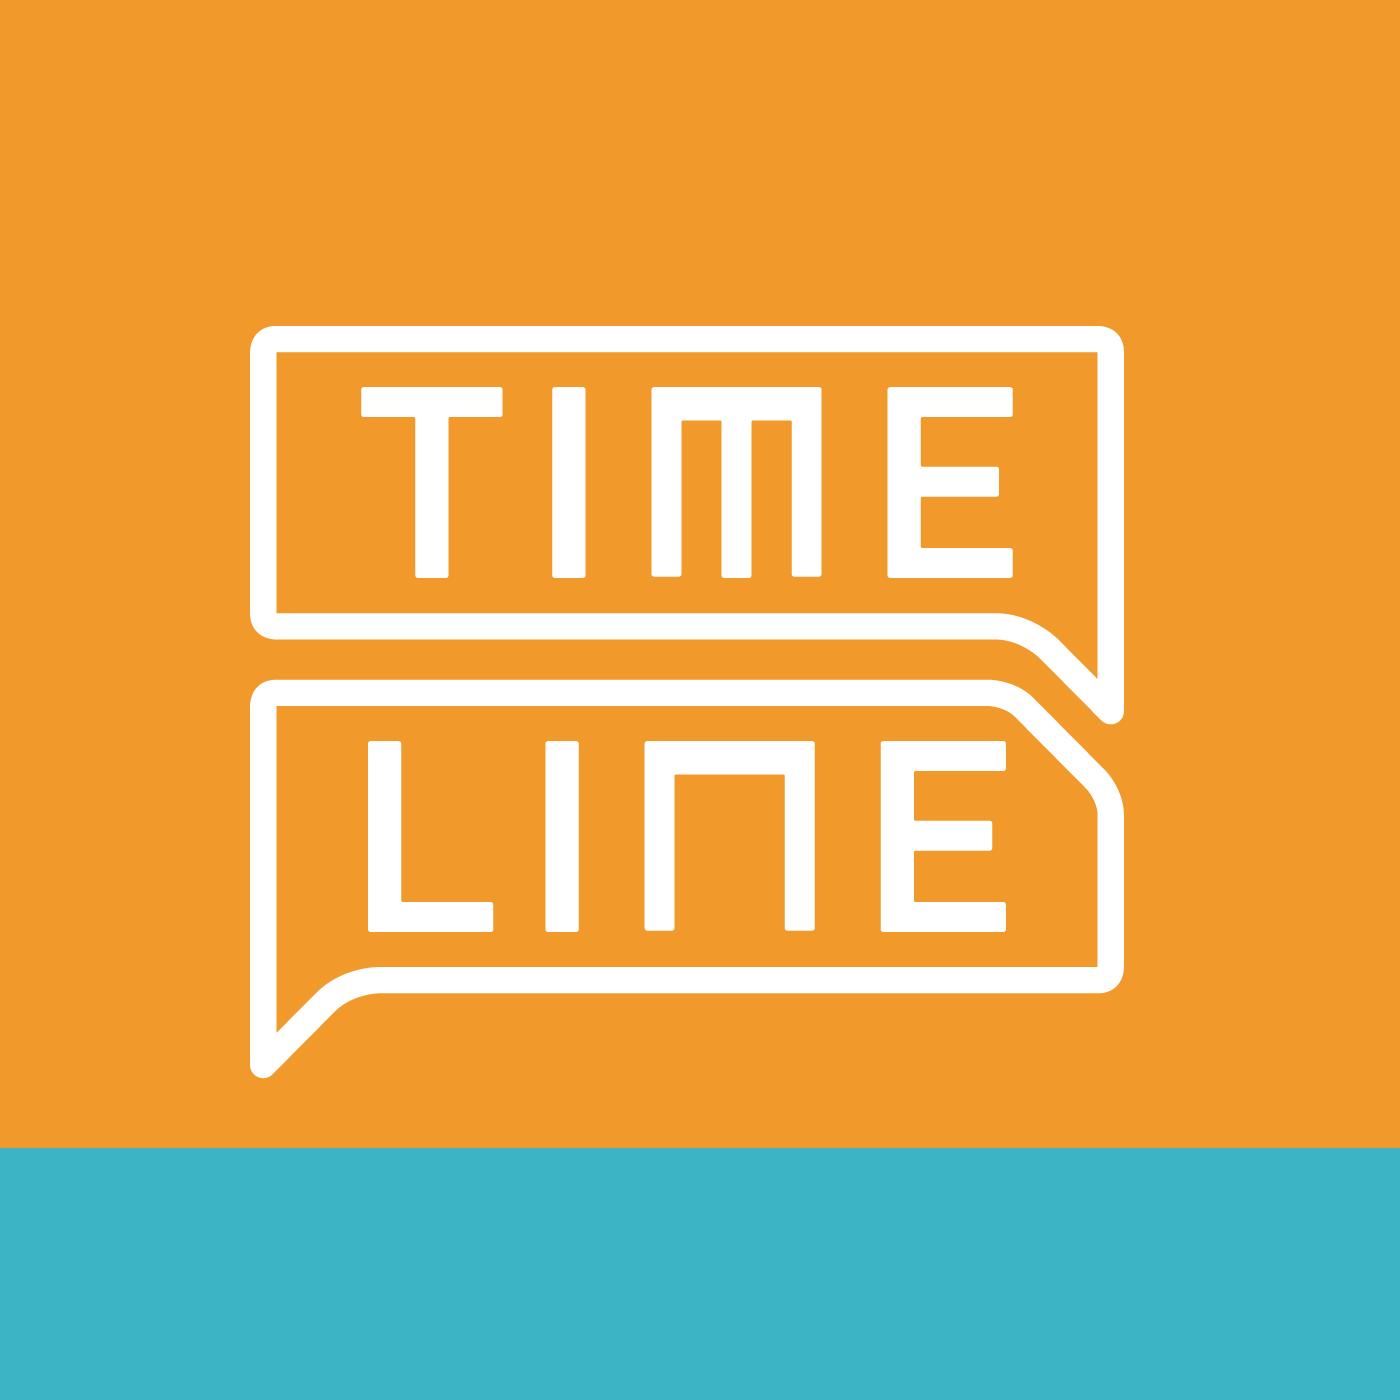 Timeline Gaúcha 20/10/2017